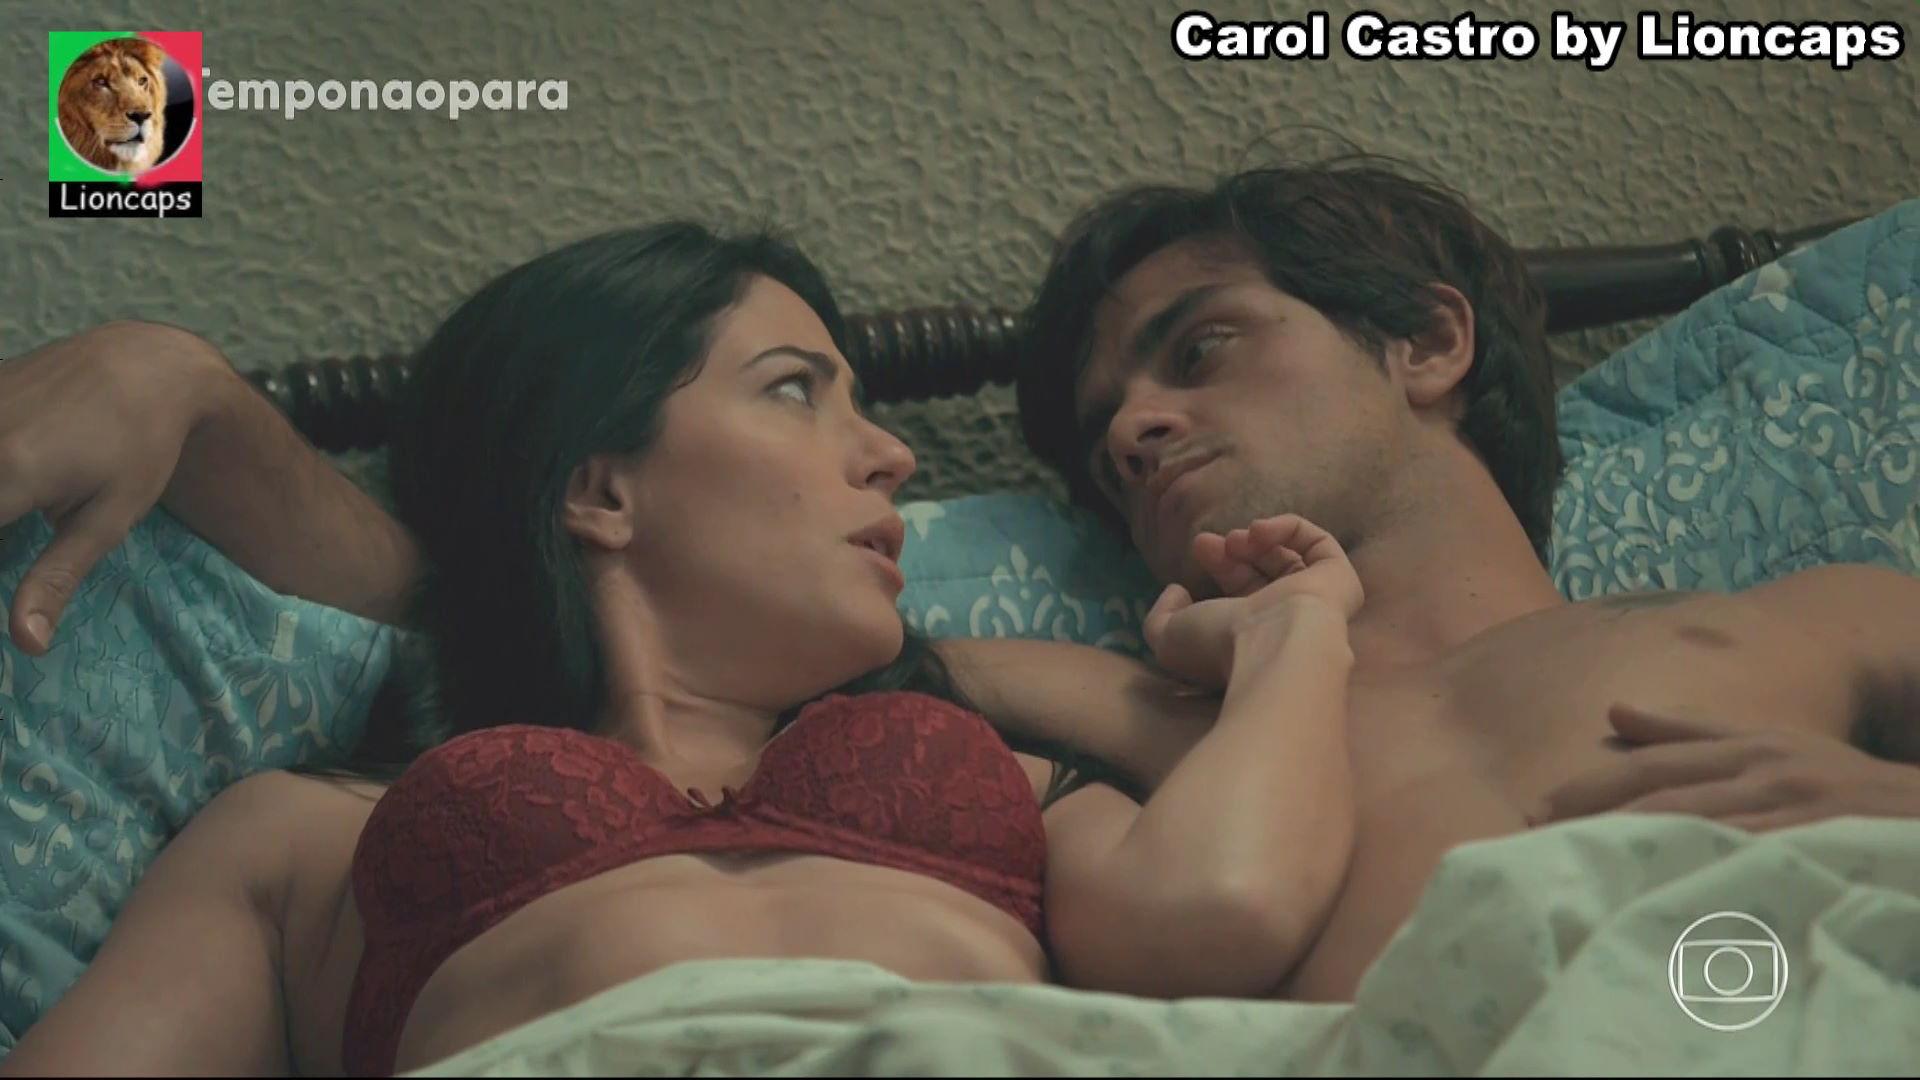 199622438_carol_castro_vs190610_14310_122_147lo.JPG